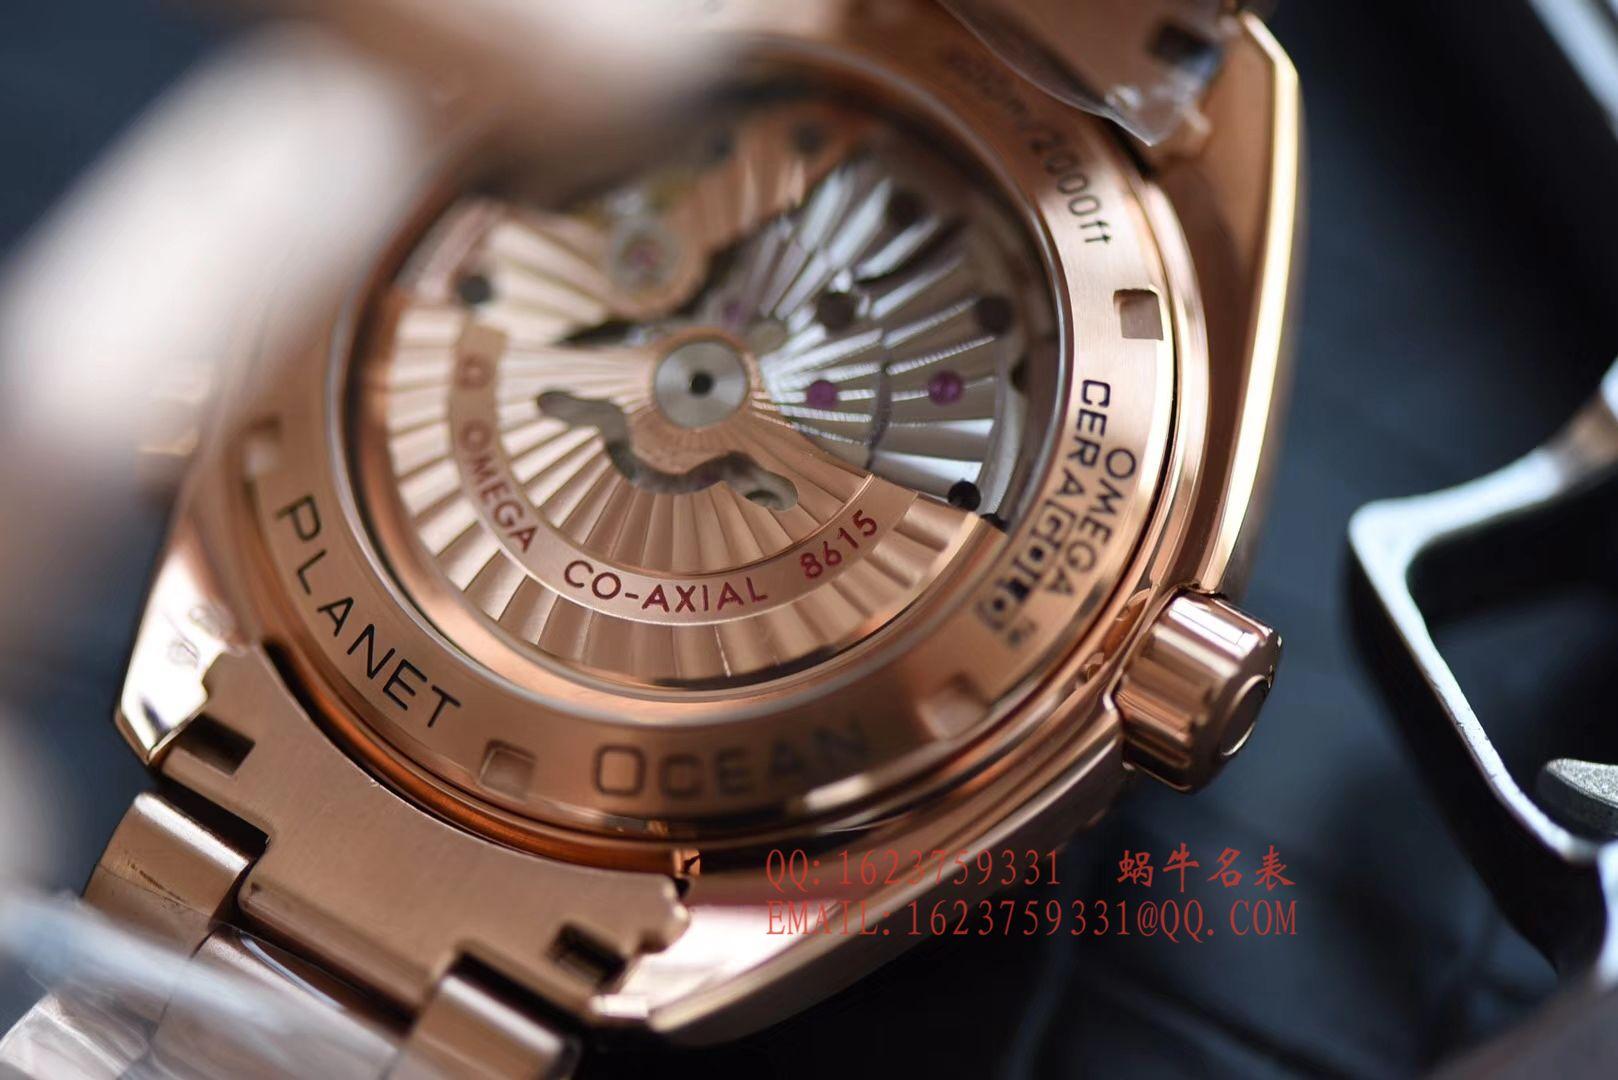 【KW一比一超A高仿手表】欧米茄海马 海洋宇宙600米系列 232.63.44.22.01.001GMT腕表 / MAI313